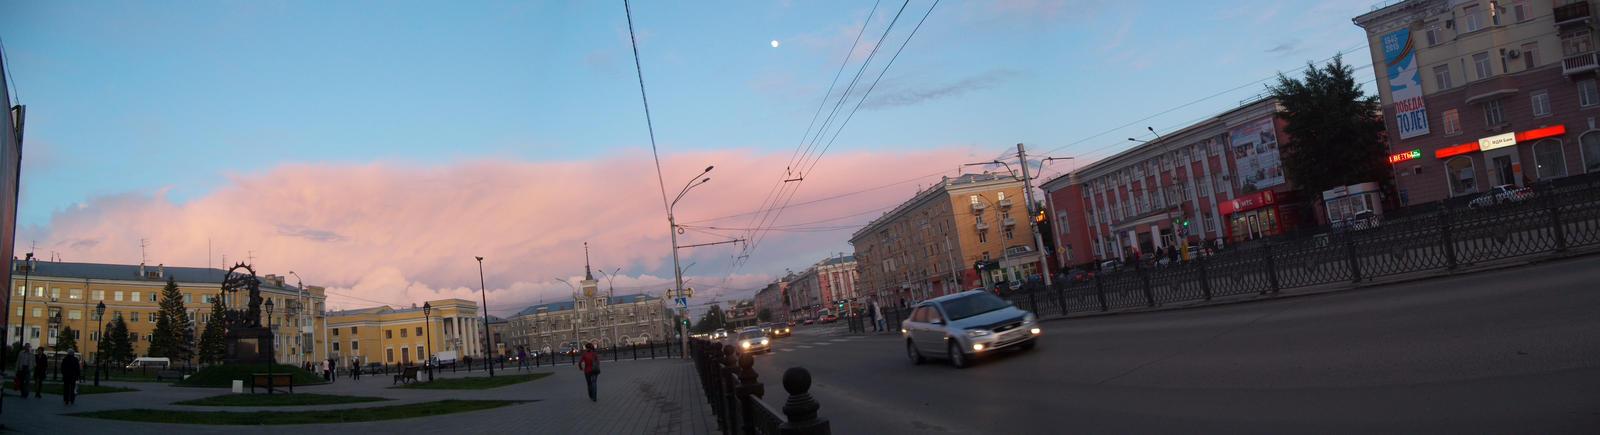 Evening sky by TiElGar